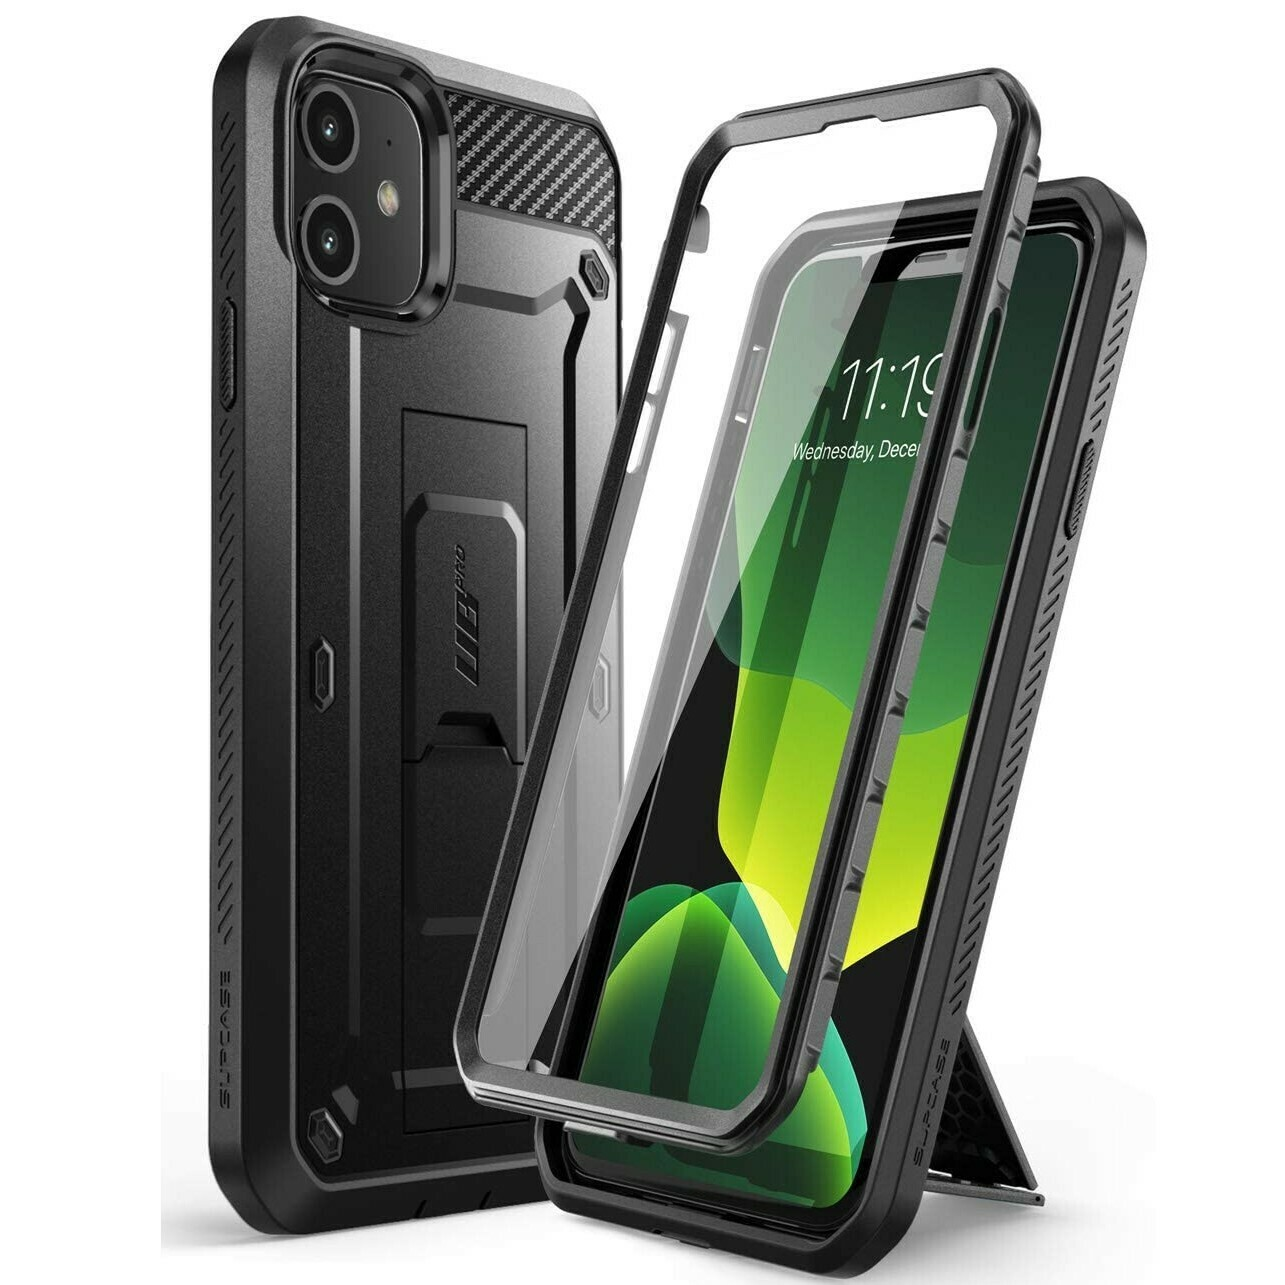 "Case Iphone 11 de 6.1"" Super Carcasa c/Mica c/ Tapa Gancho c/Parante"